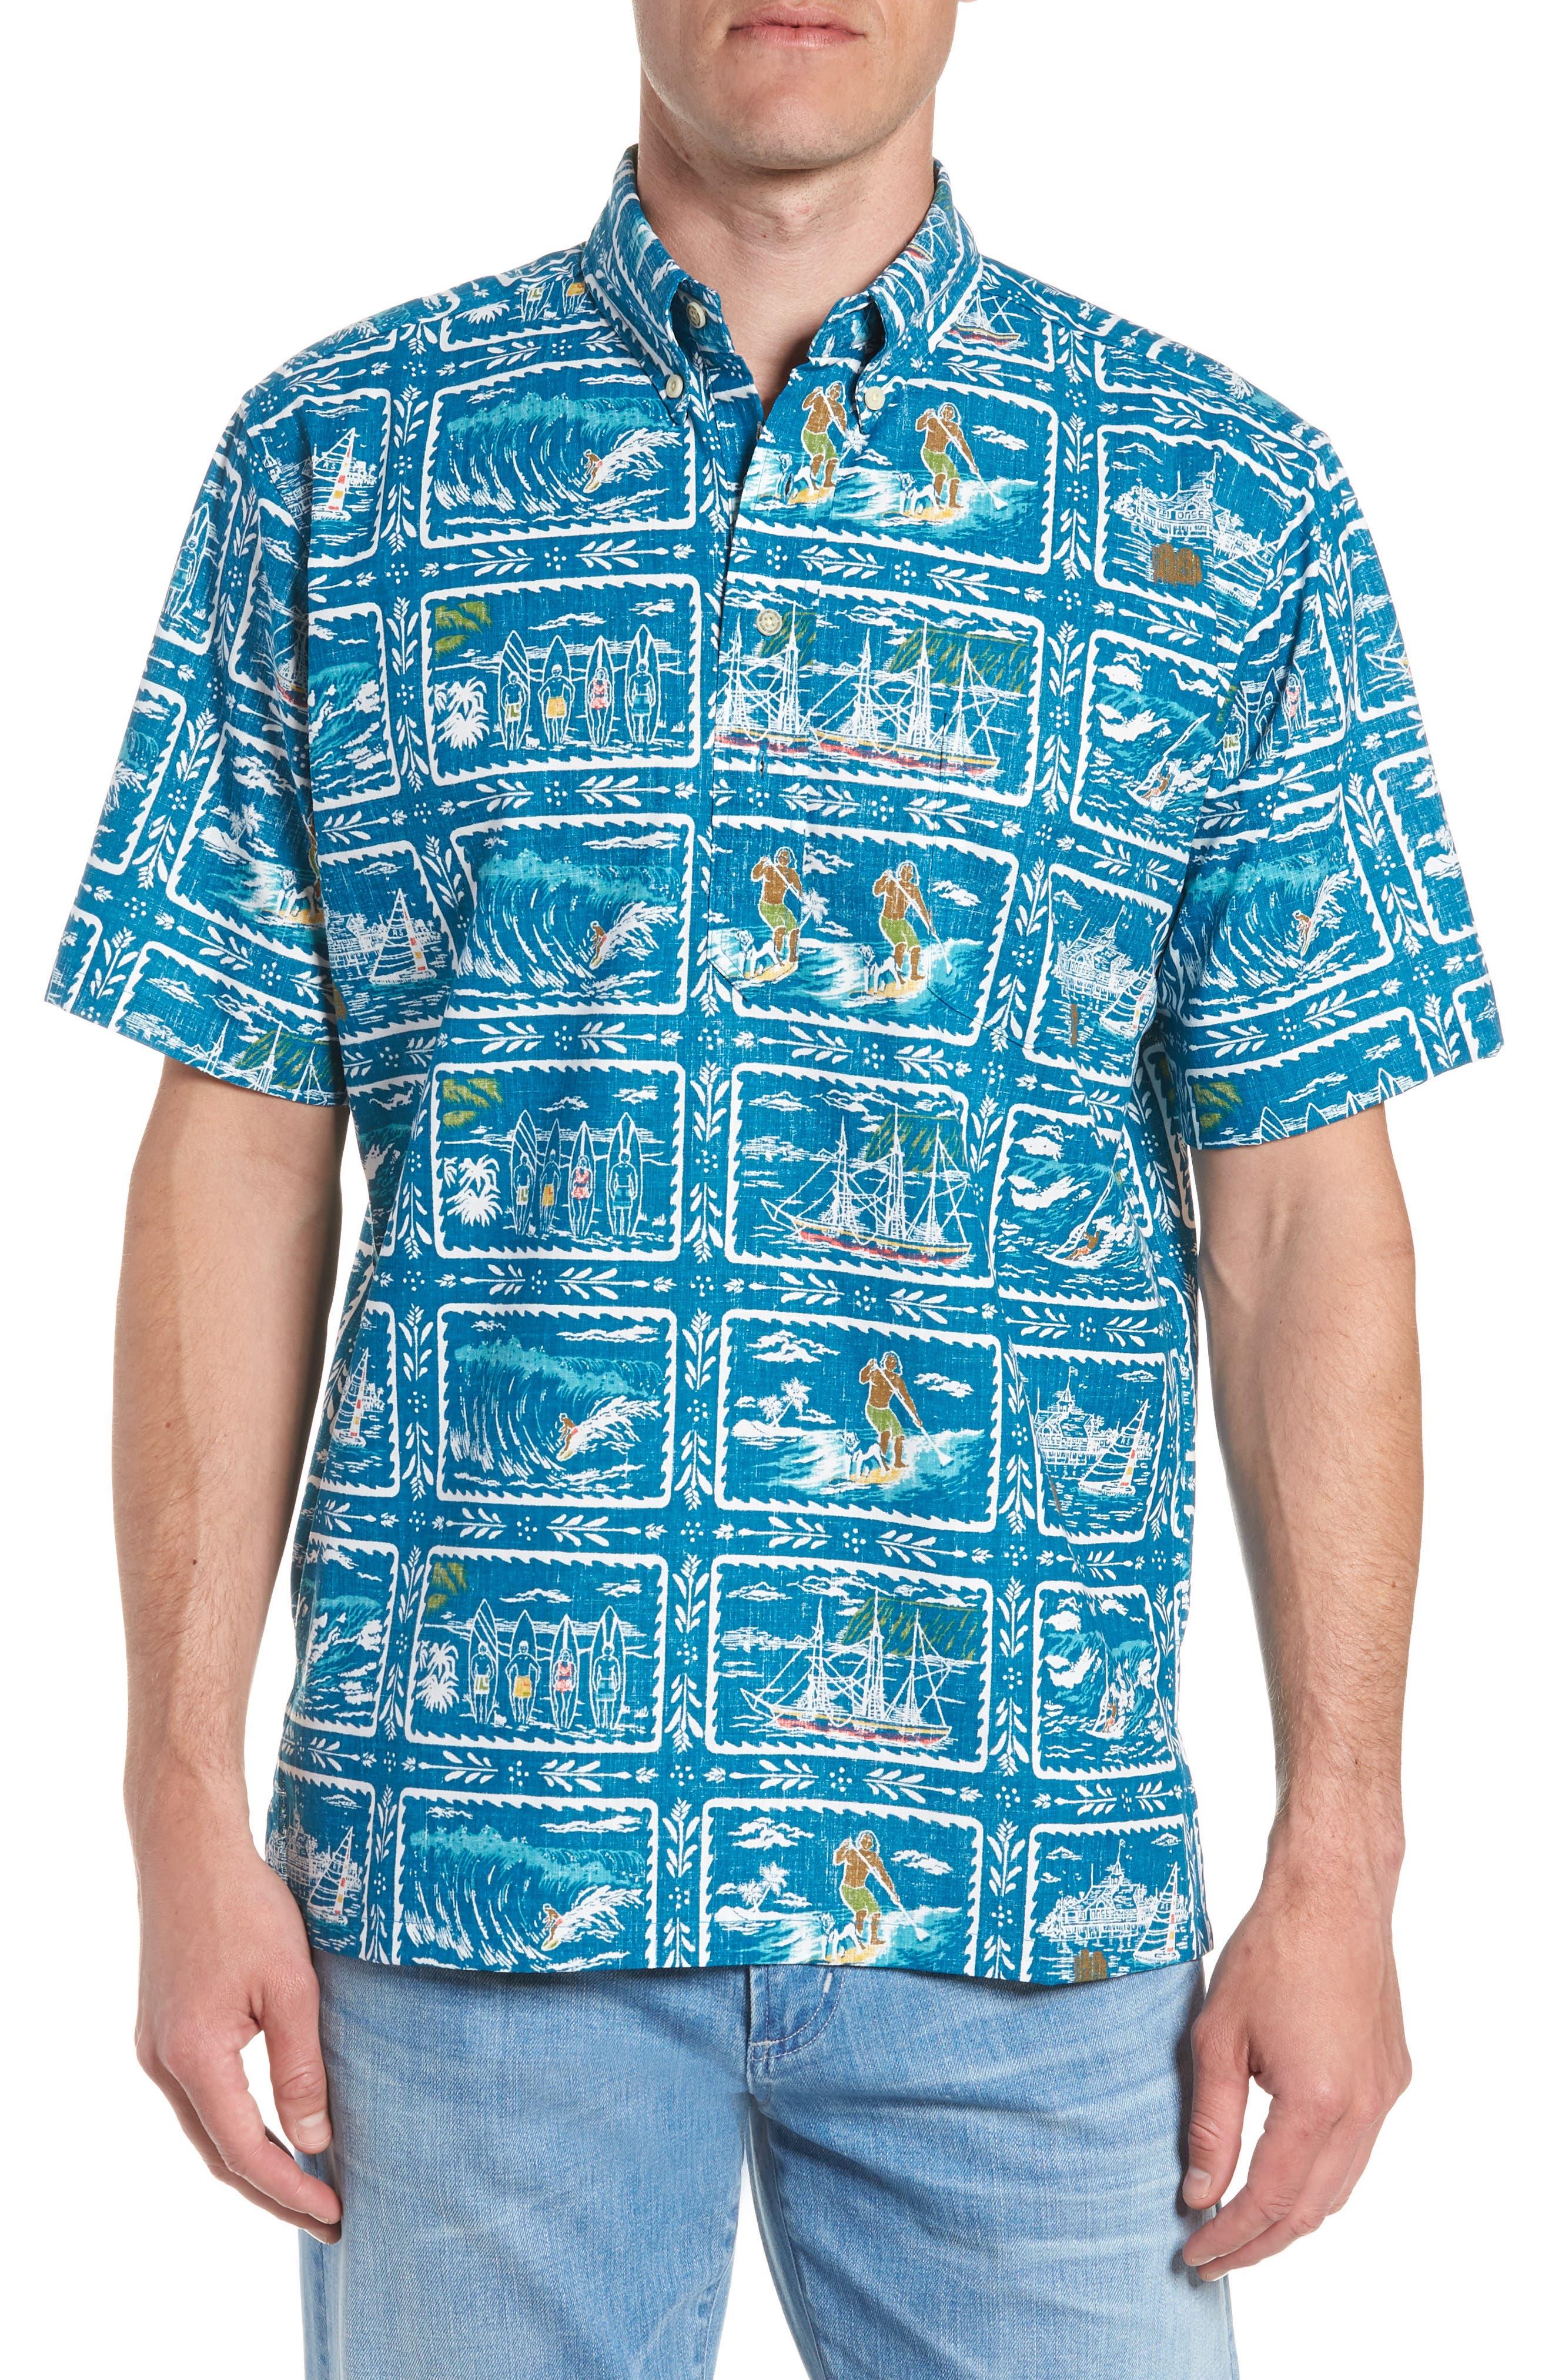 REYN SPOONER, Hawaiian Sports Classic Fit Pullover Sport Shirt, Main thumbnail 1, color, BLUE